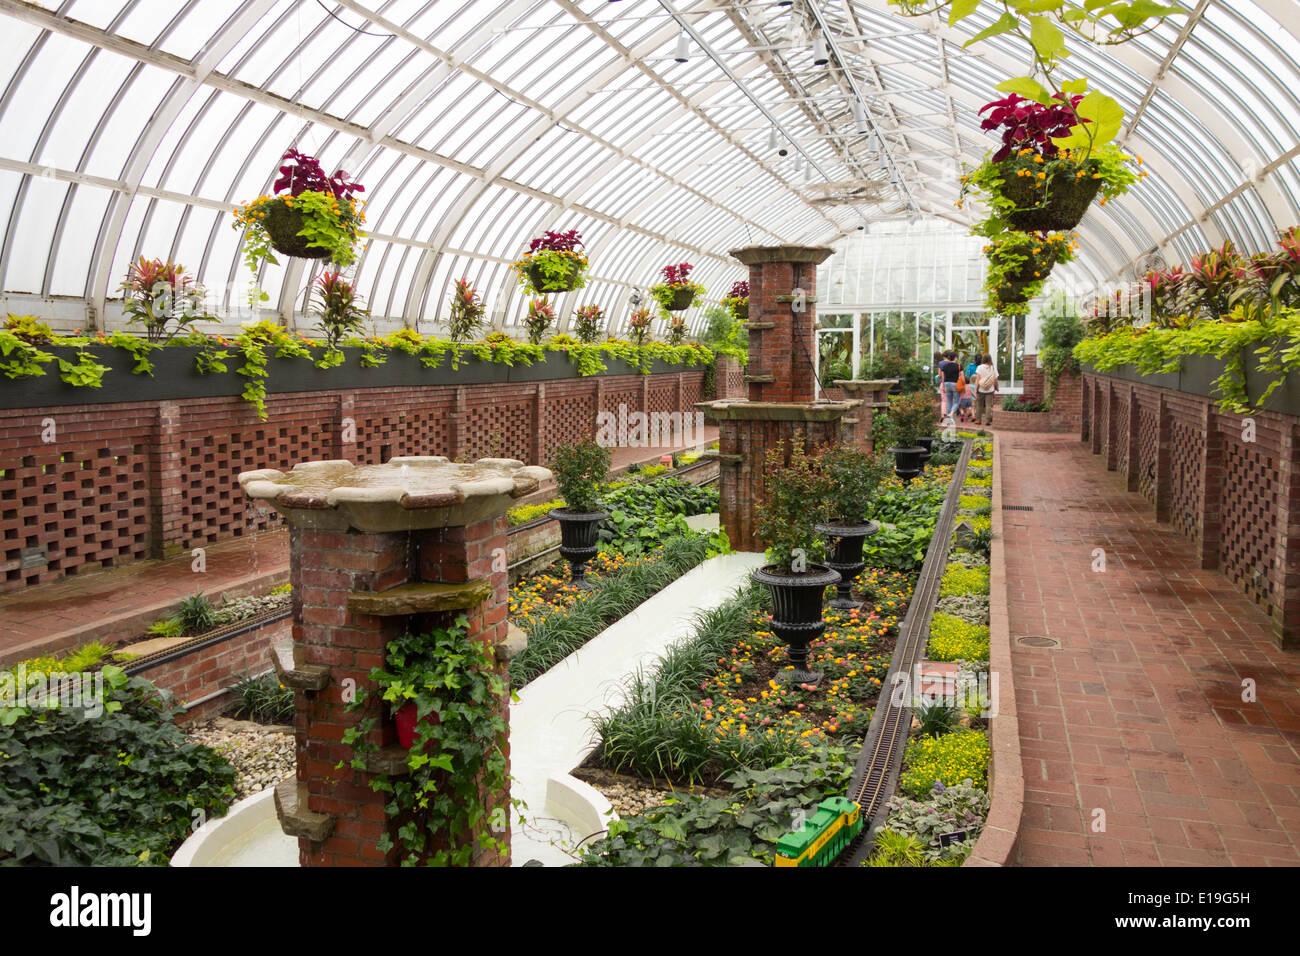 Pittsburgh Botanic Garden Stock Photos & Pittsburgh Botanic Garden ...